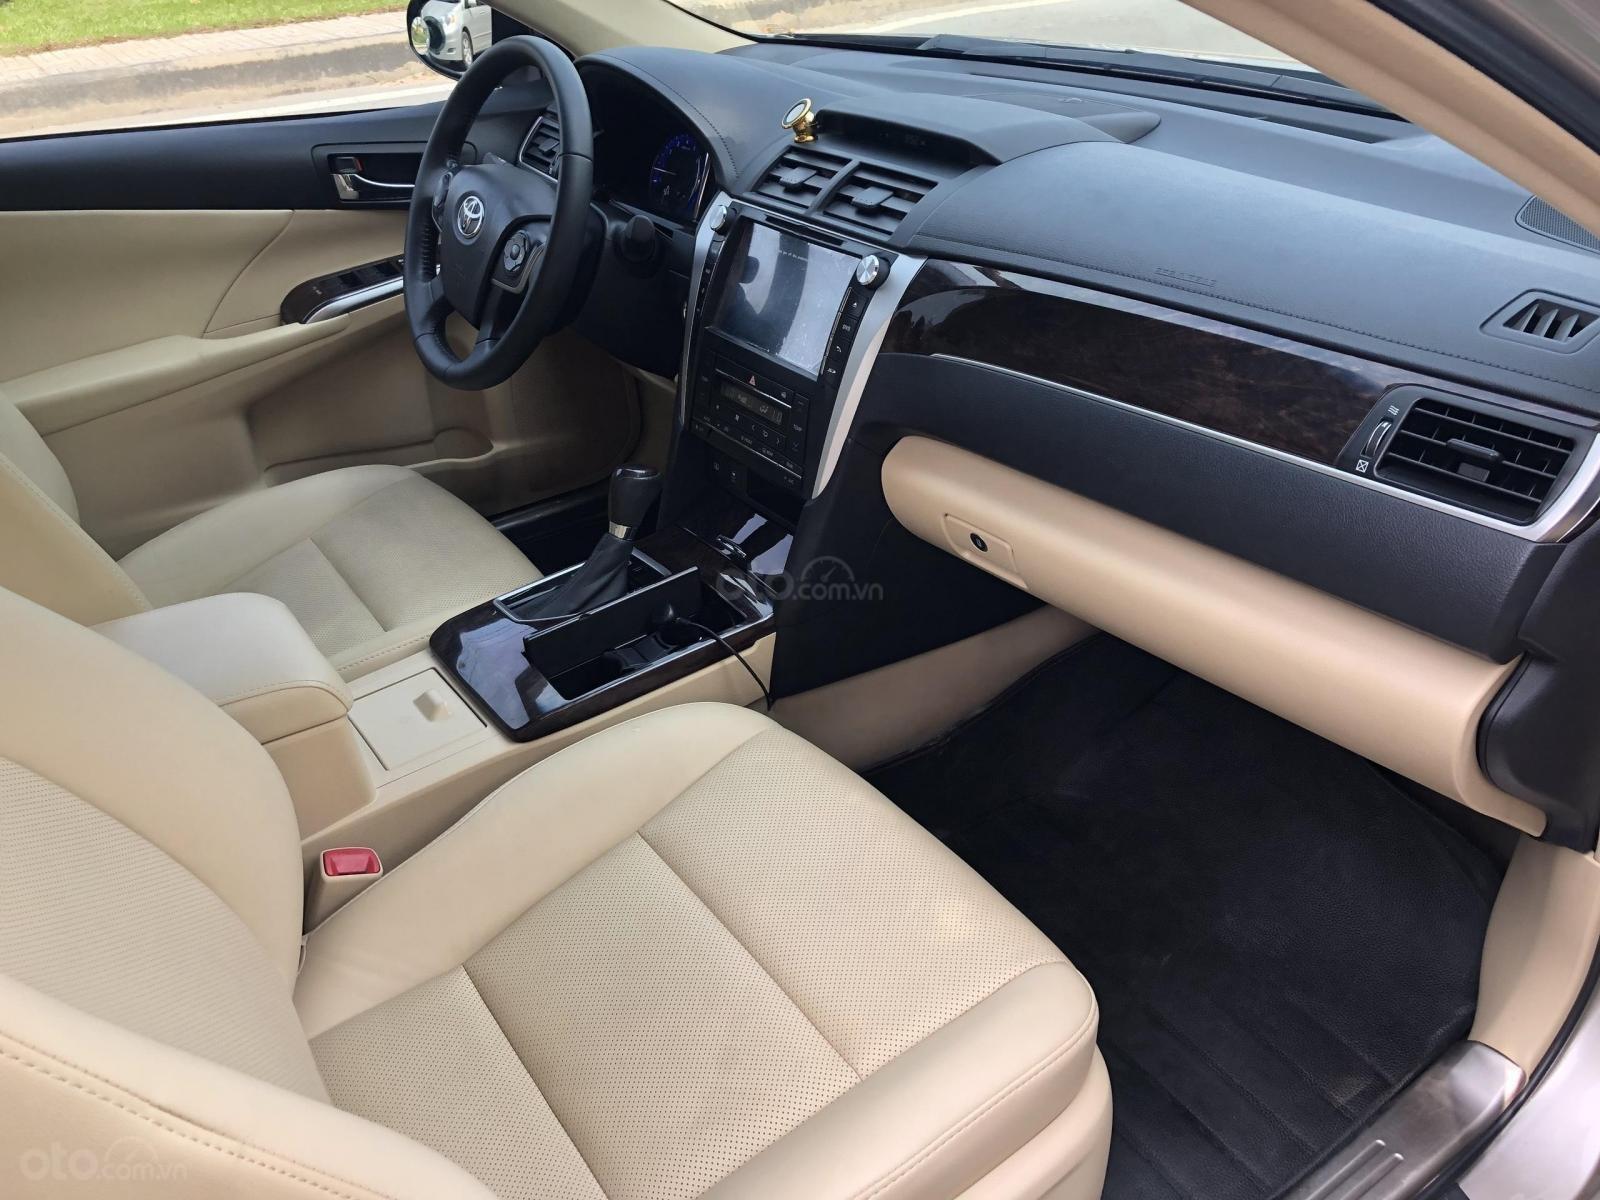 Cần bán Toyota Camry model 2018 (6)